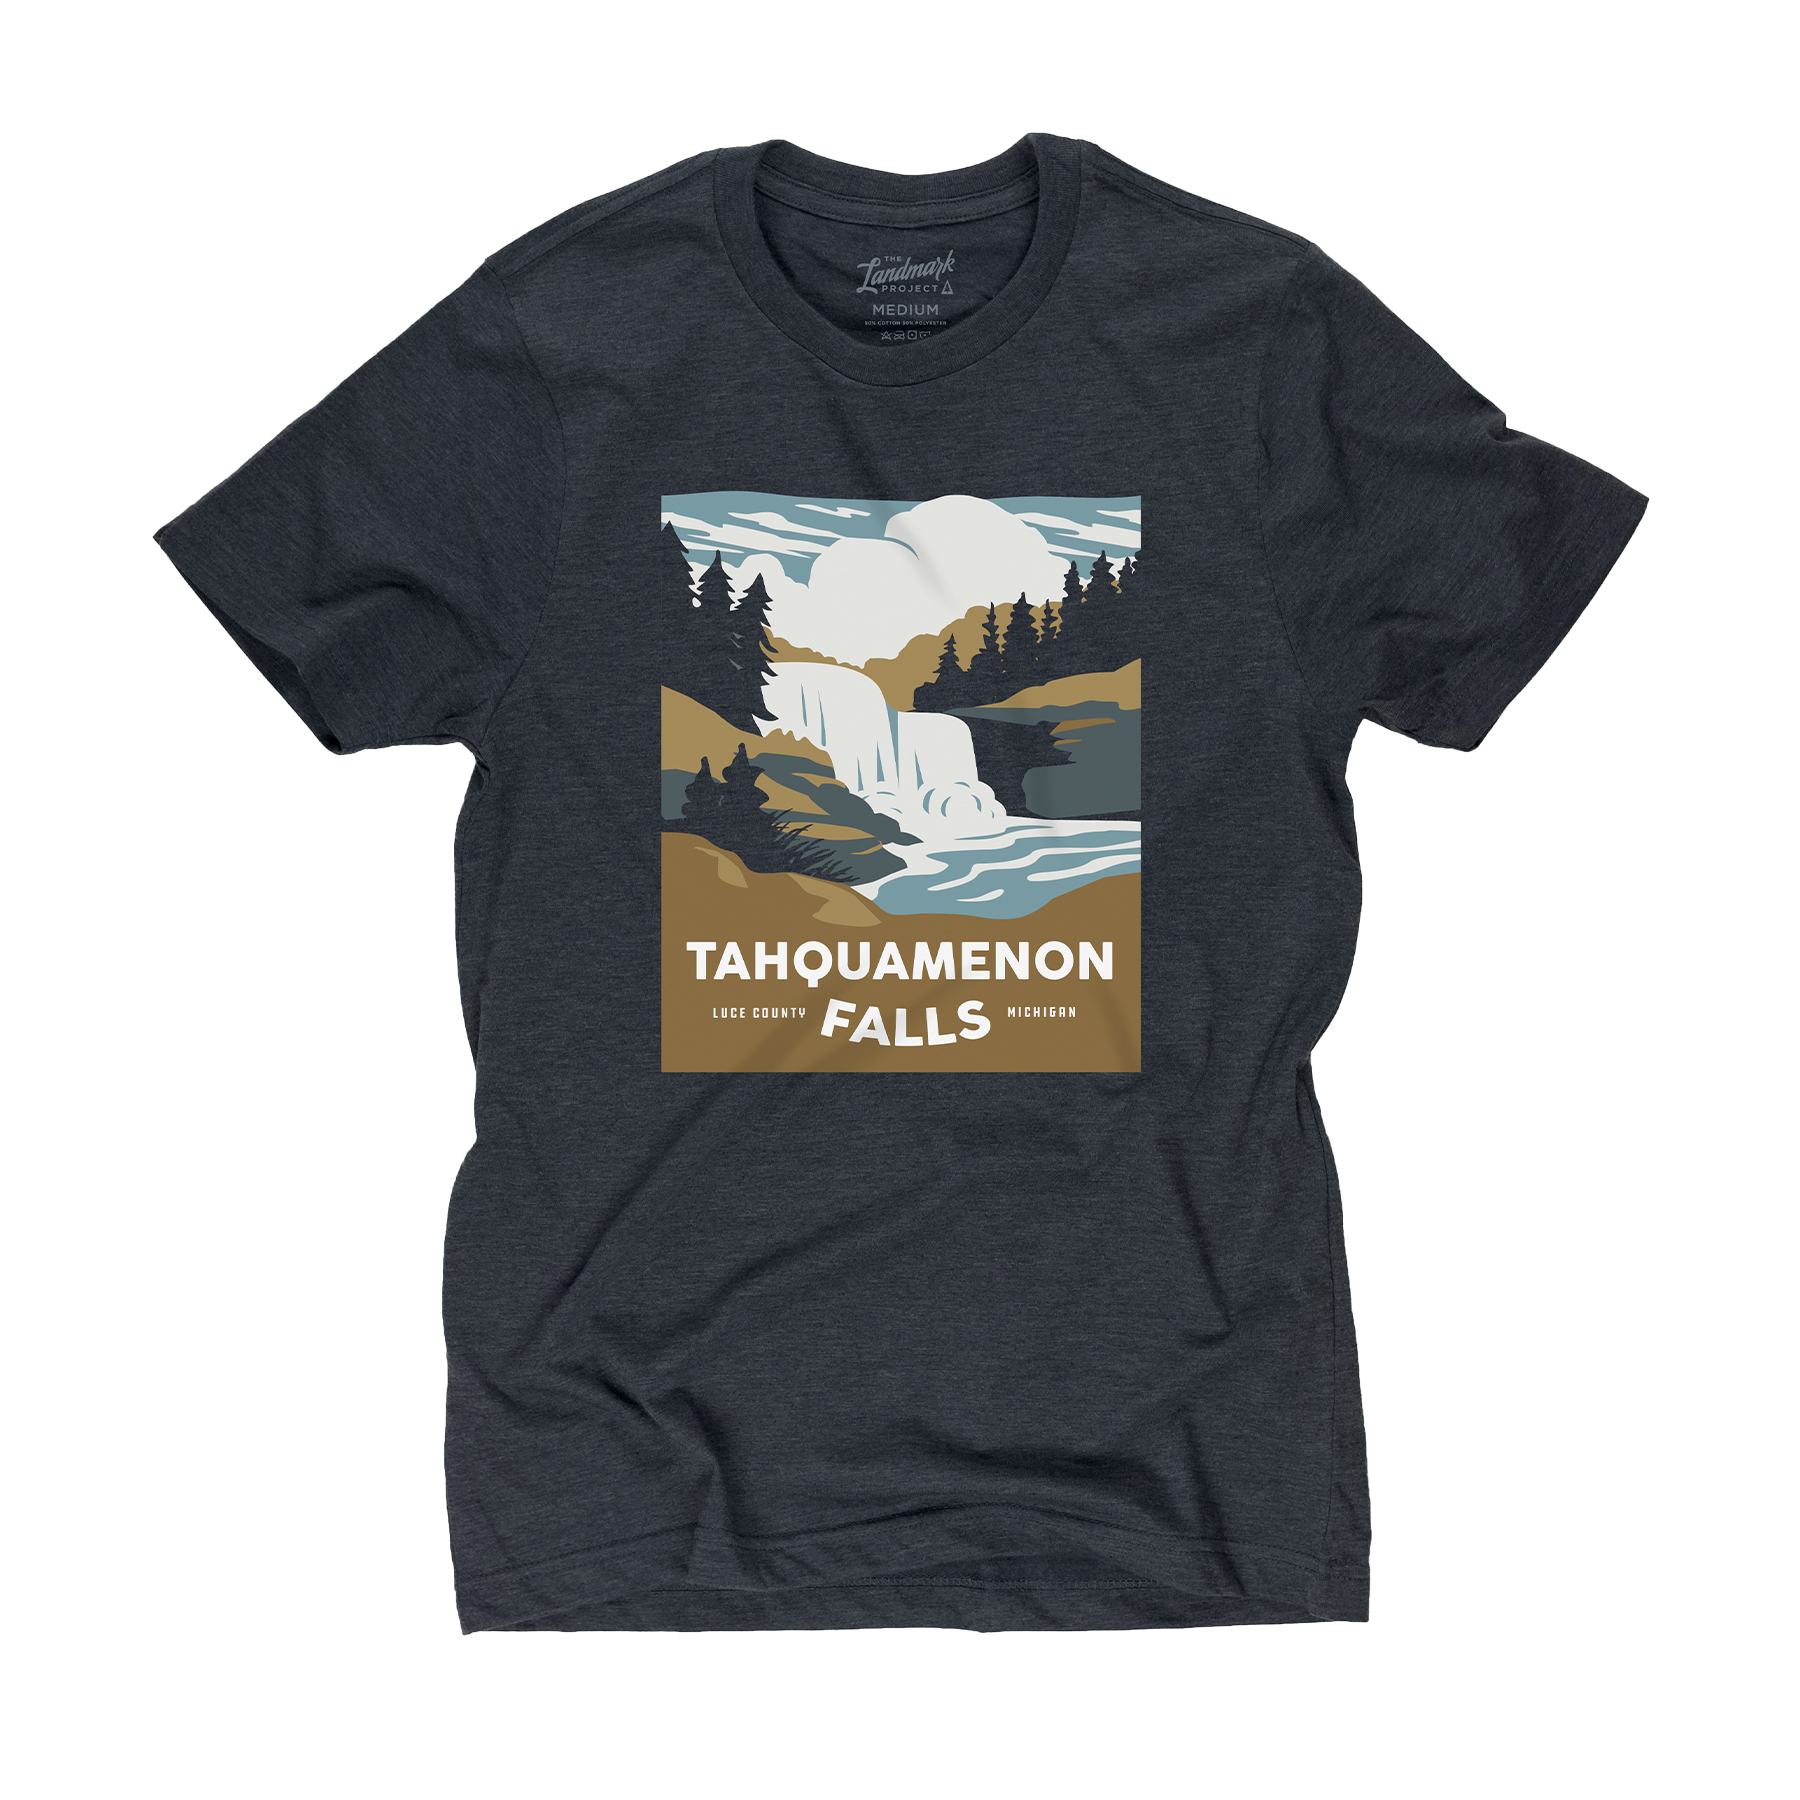 tahquamenon-falls-tee-navy.jpg